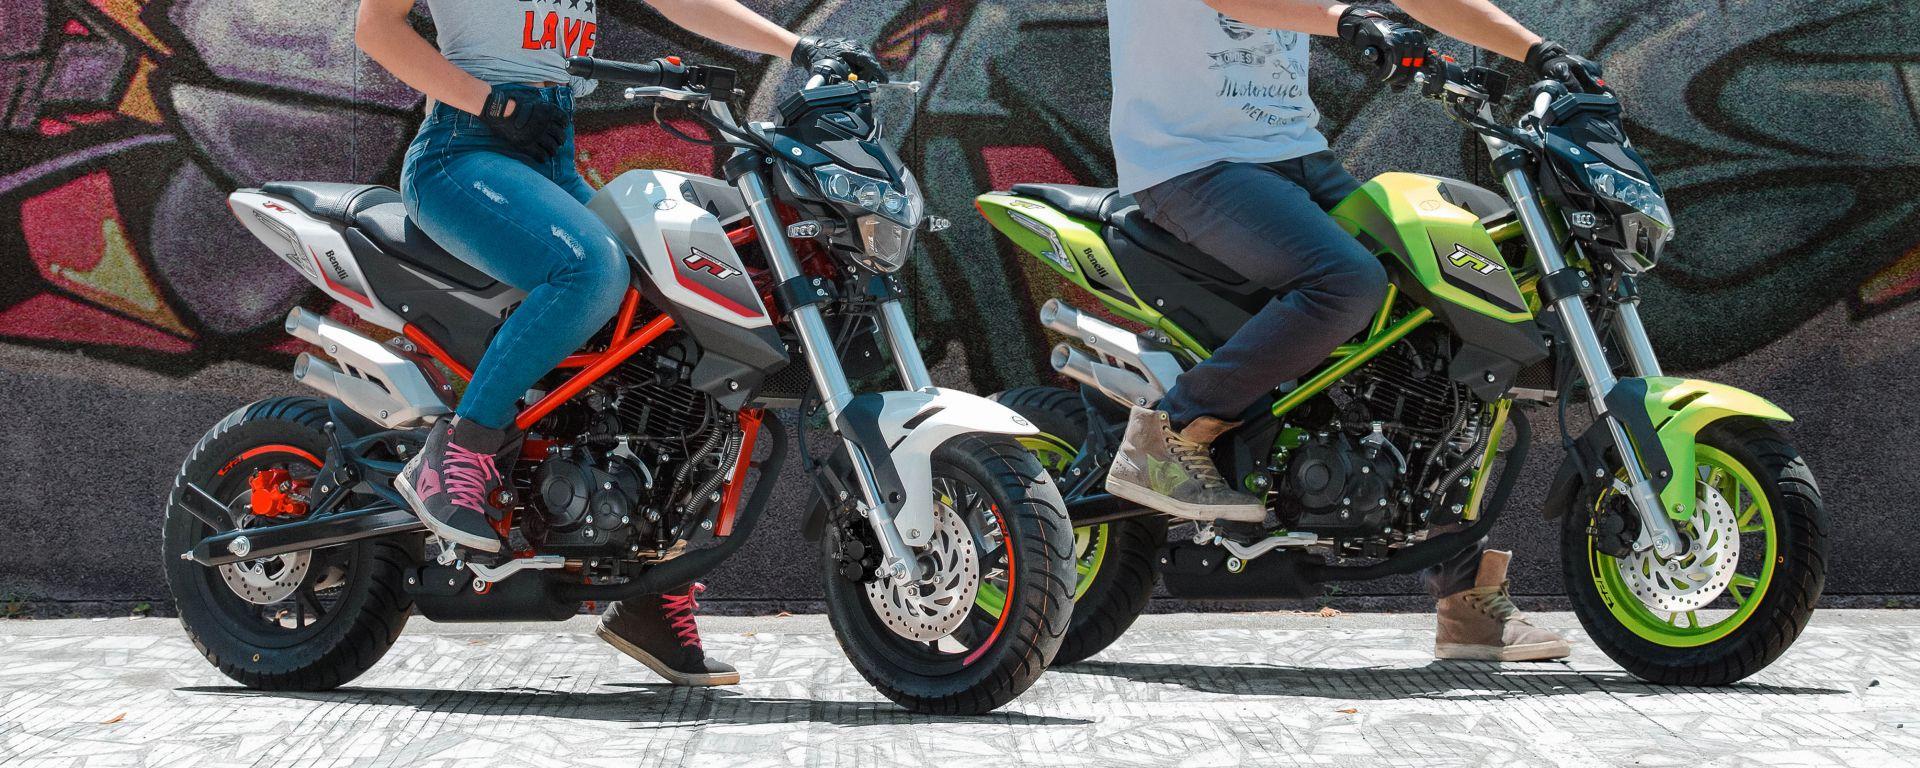 Benelli Tornado Naked T 125 model year 2020